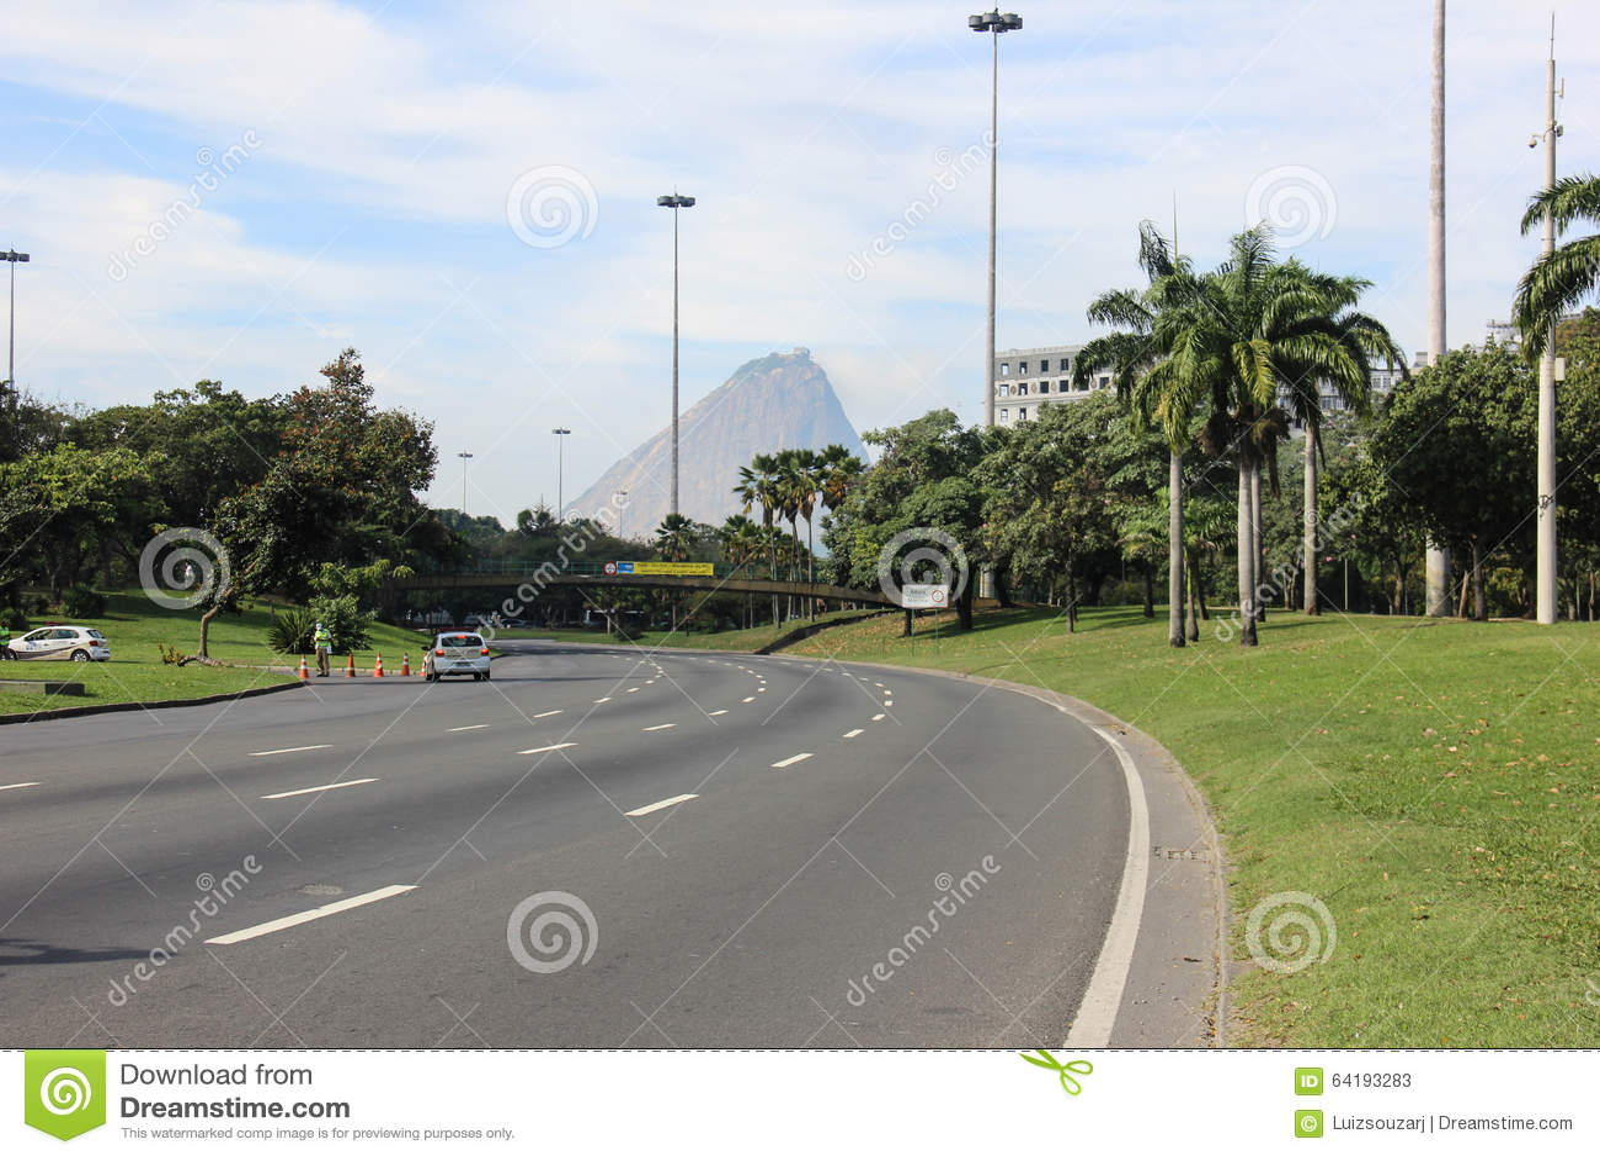 Aterro Do Flamengo Park In Rio De Janeiro Stock Image Image Of Leisure Vehicle 64193283